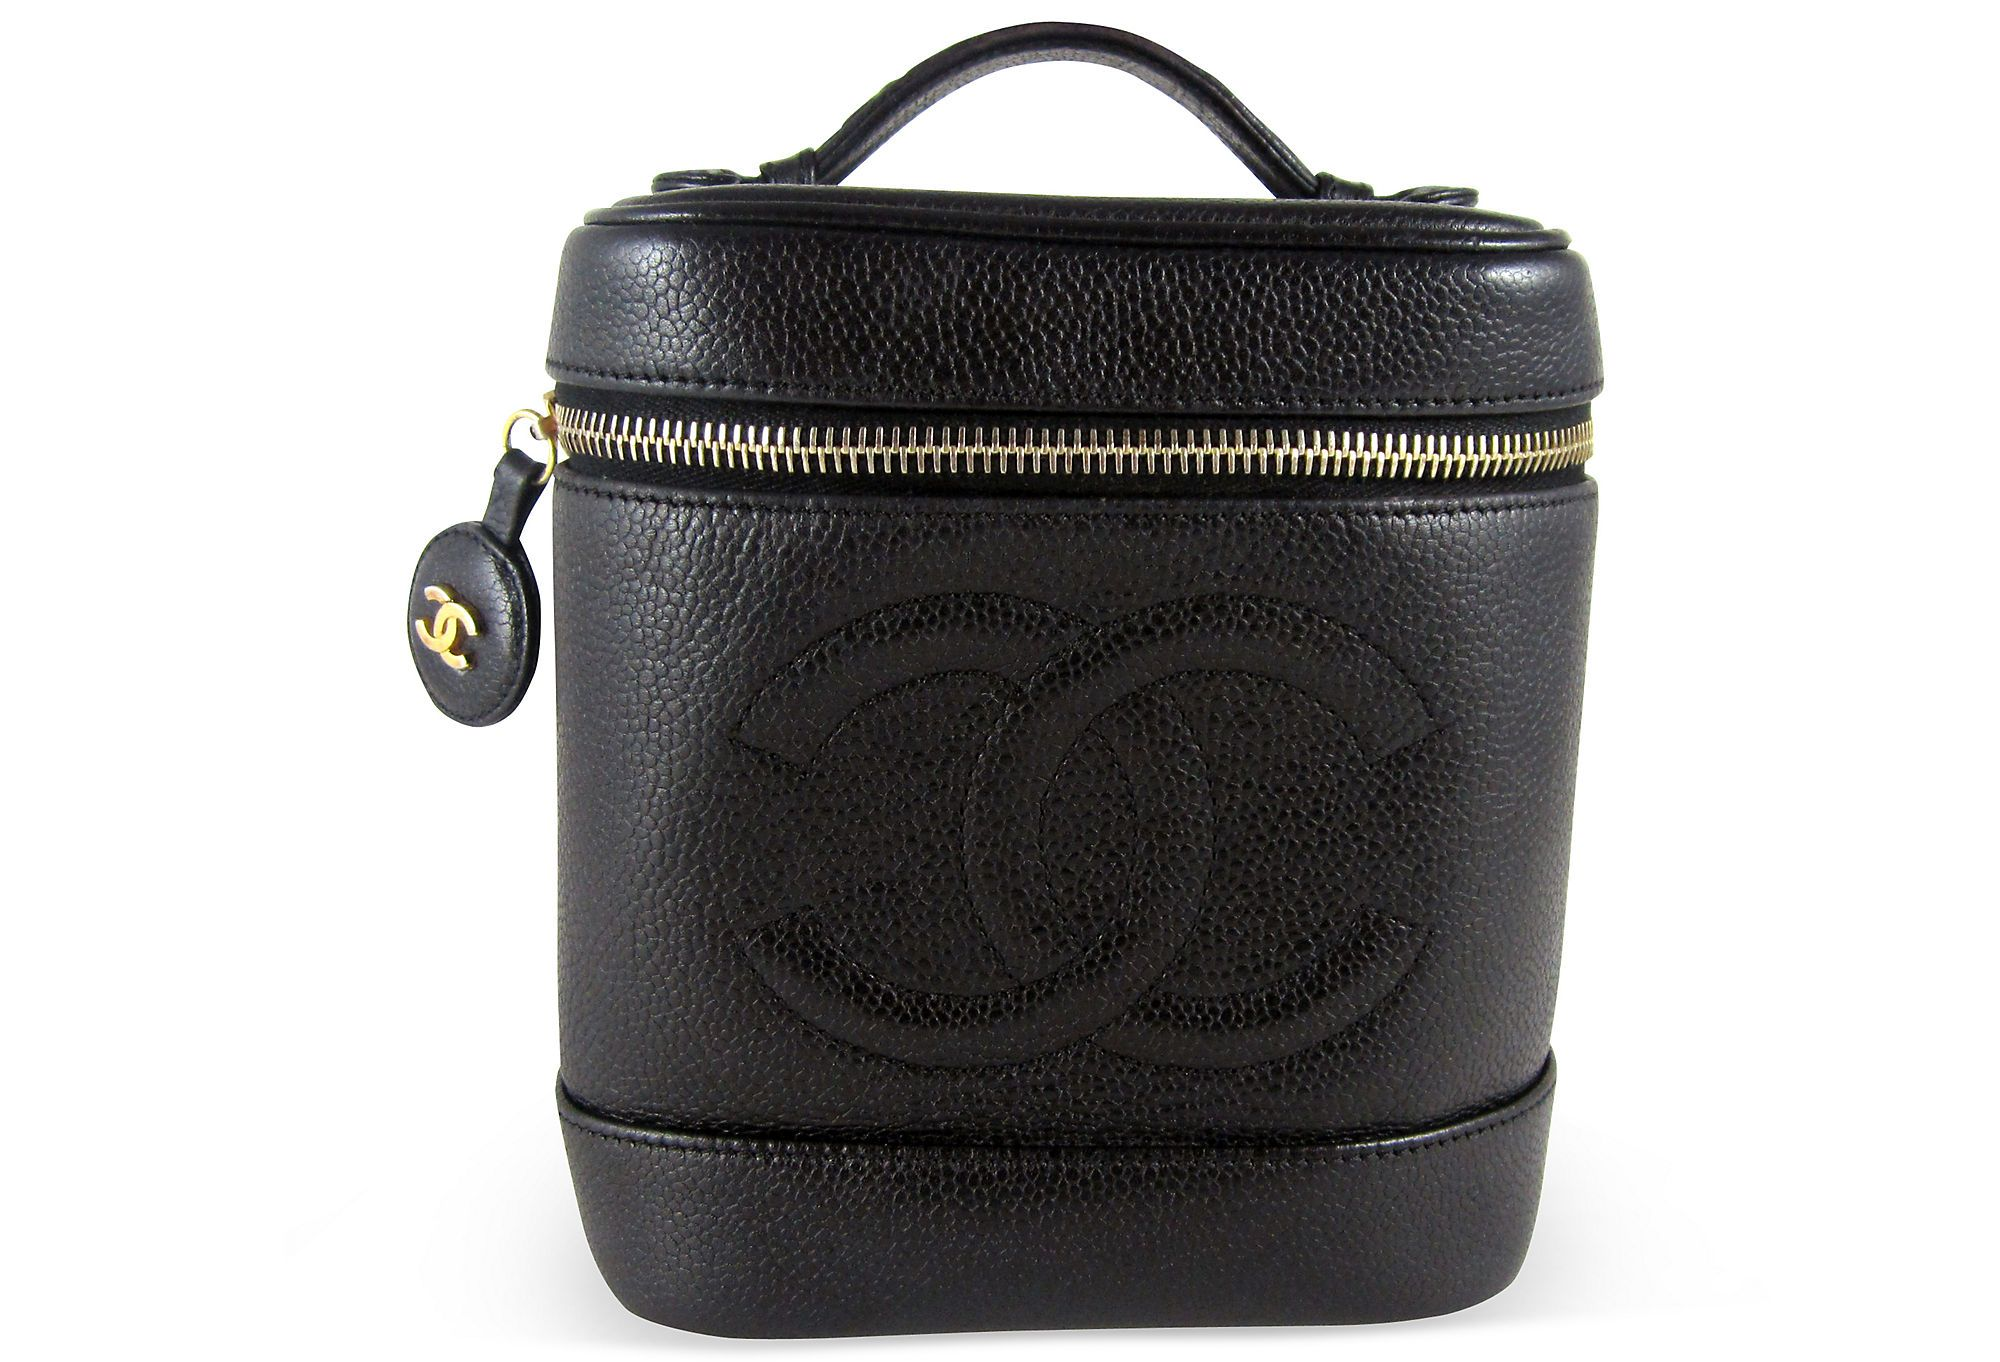 Chanel Vanity Case I  499.00   My Style   Pinterest   Caviar ... 83e36c7c40